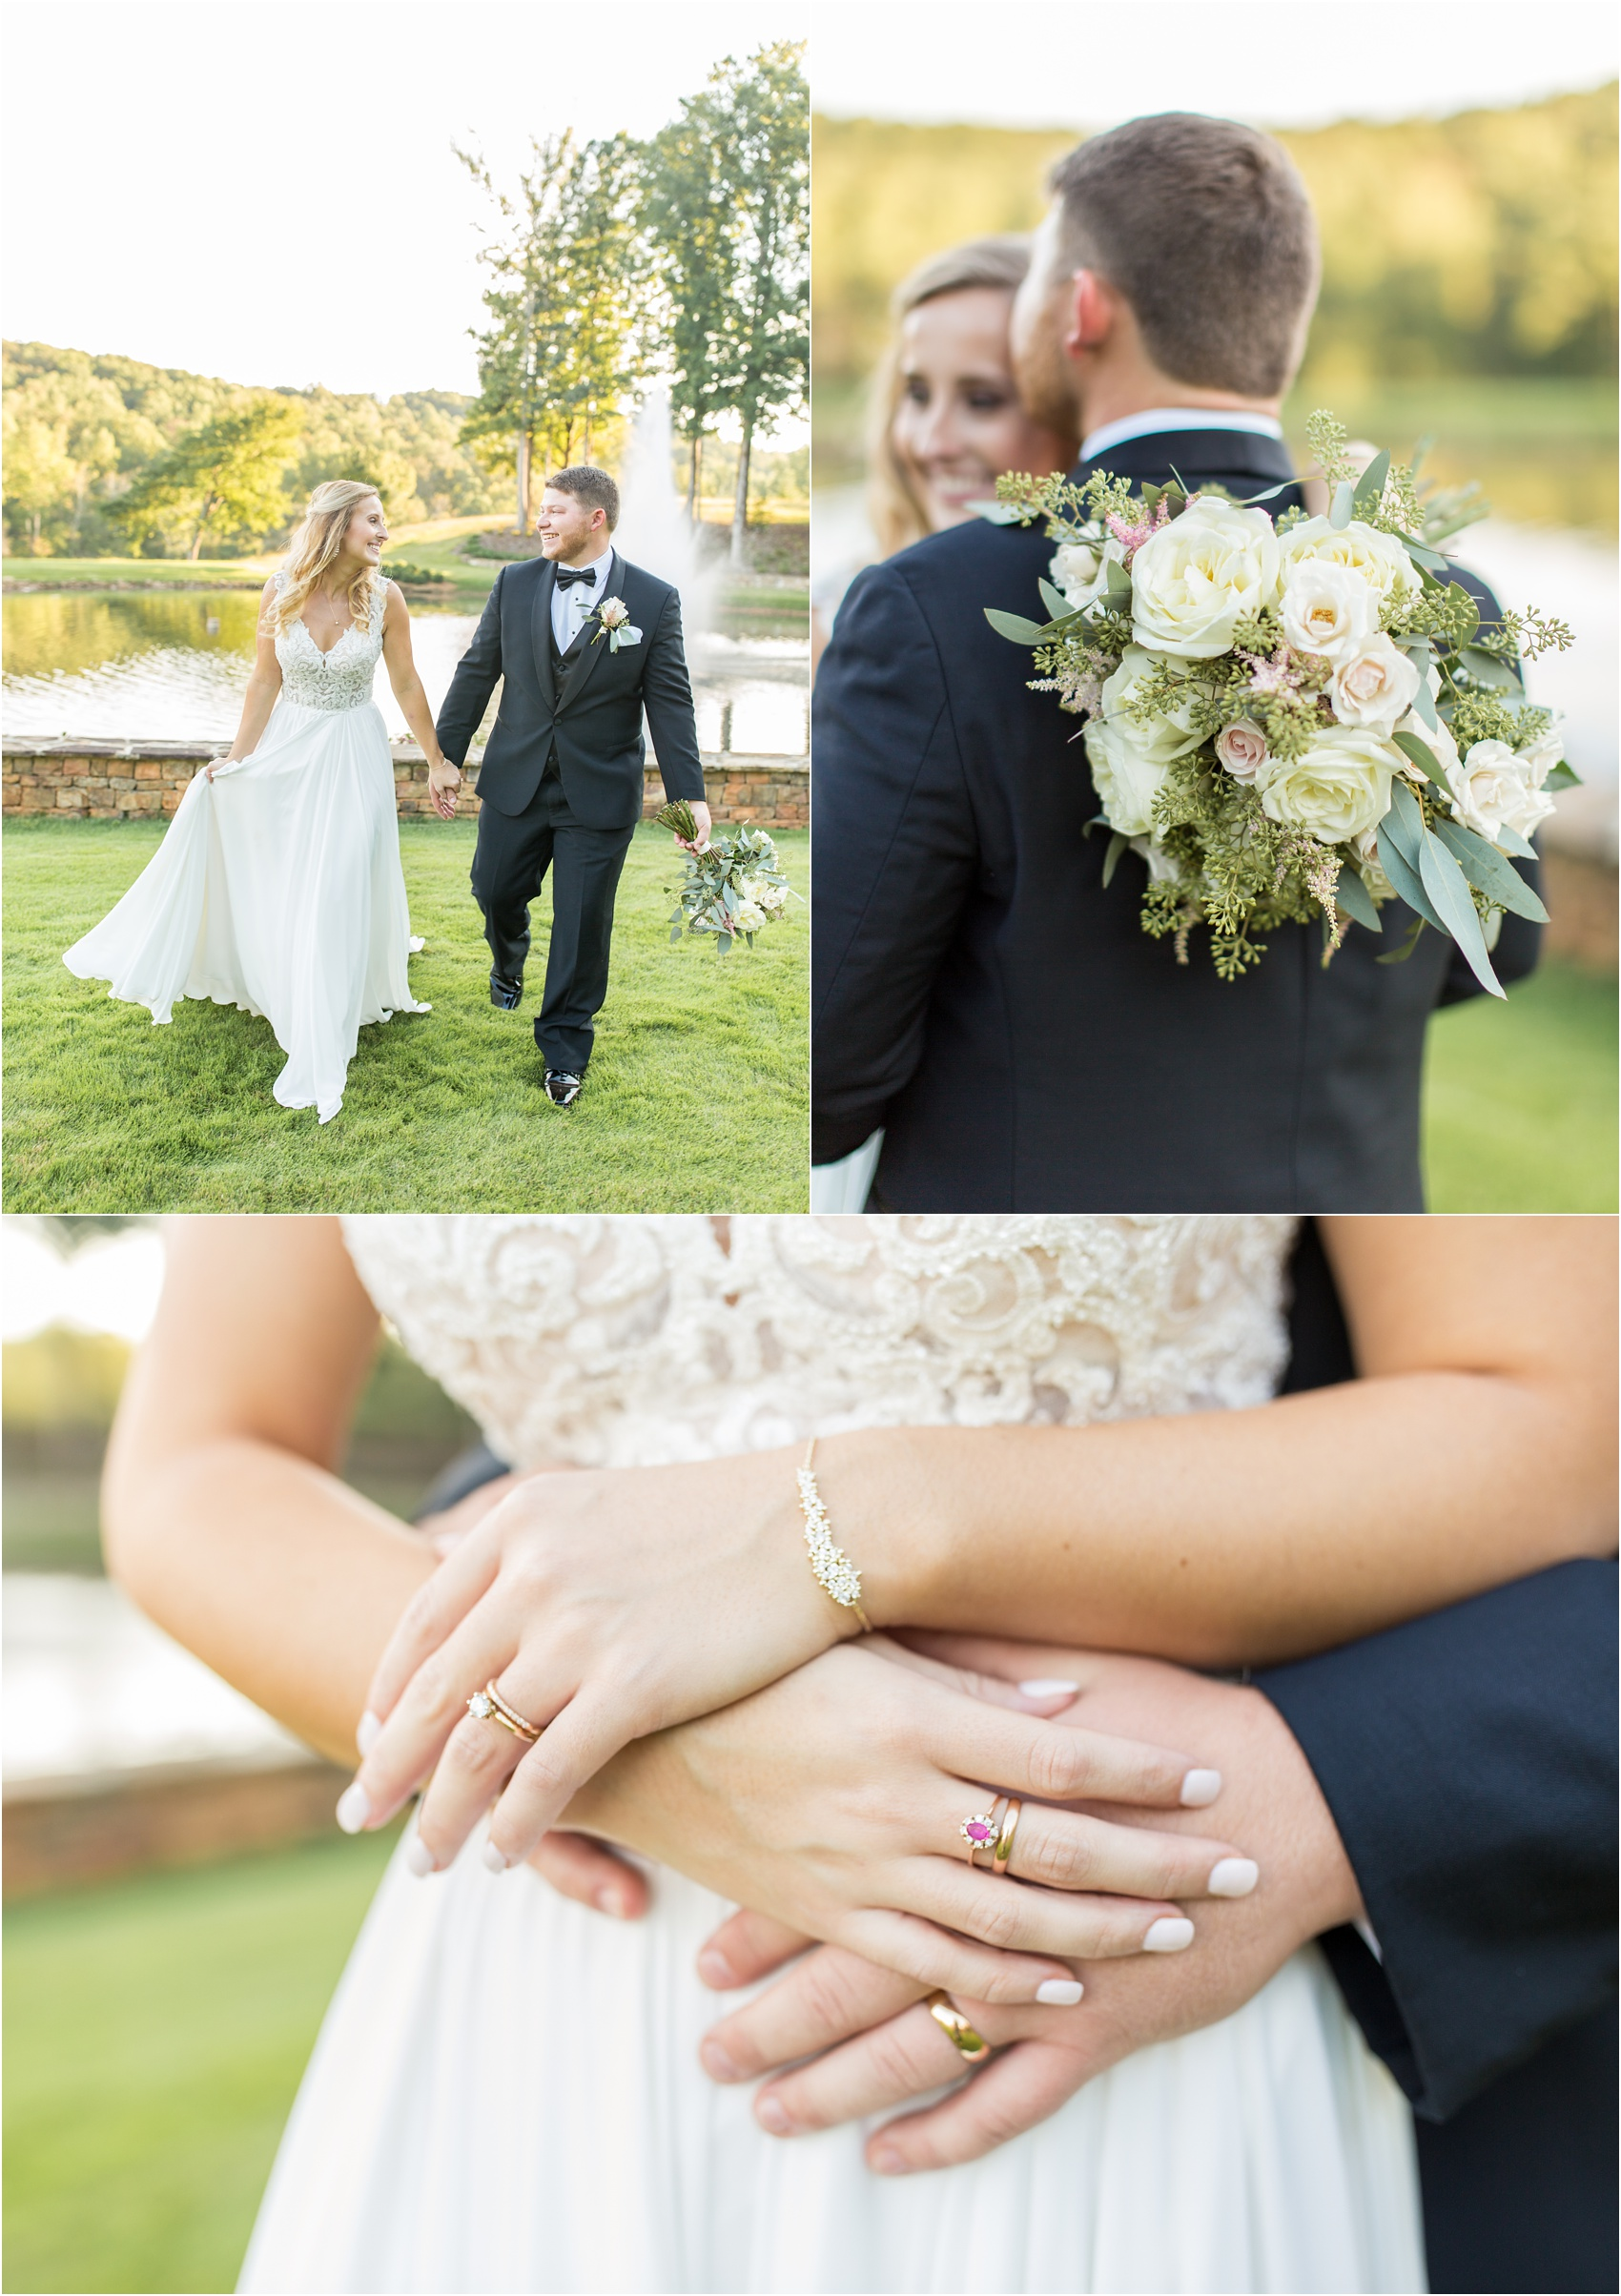 Savannah Eve Photography- Jurek-Woodworth Wedding- Sneak Peek-72.jpg